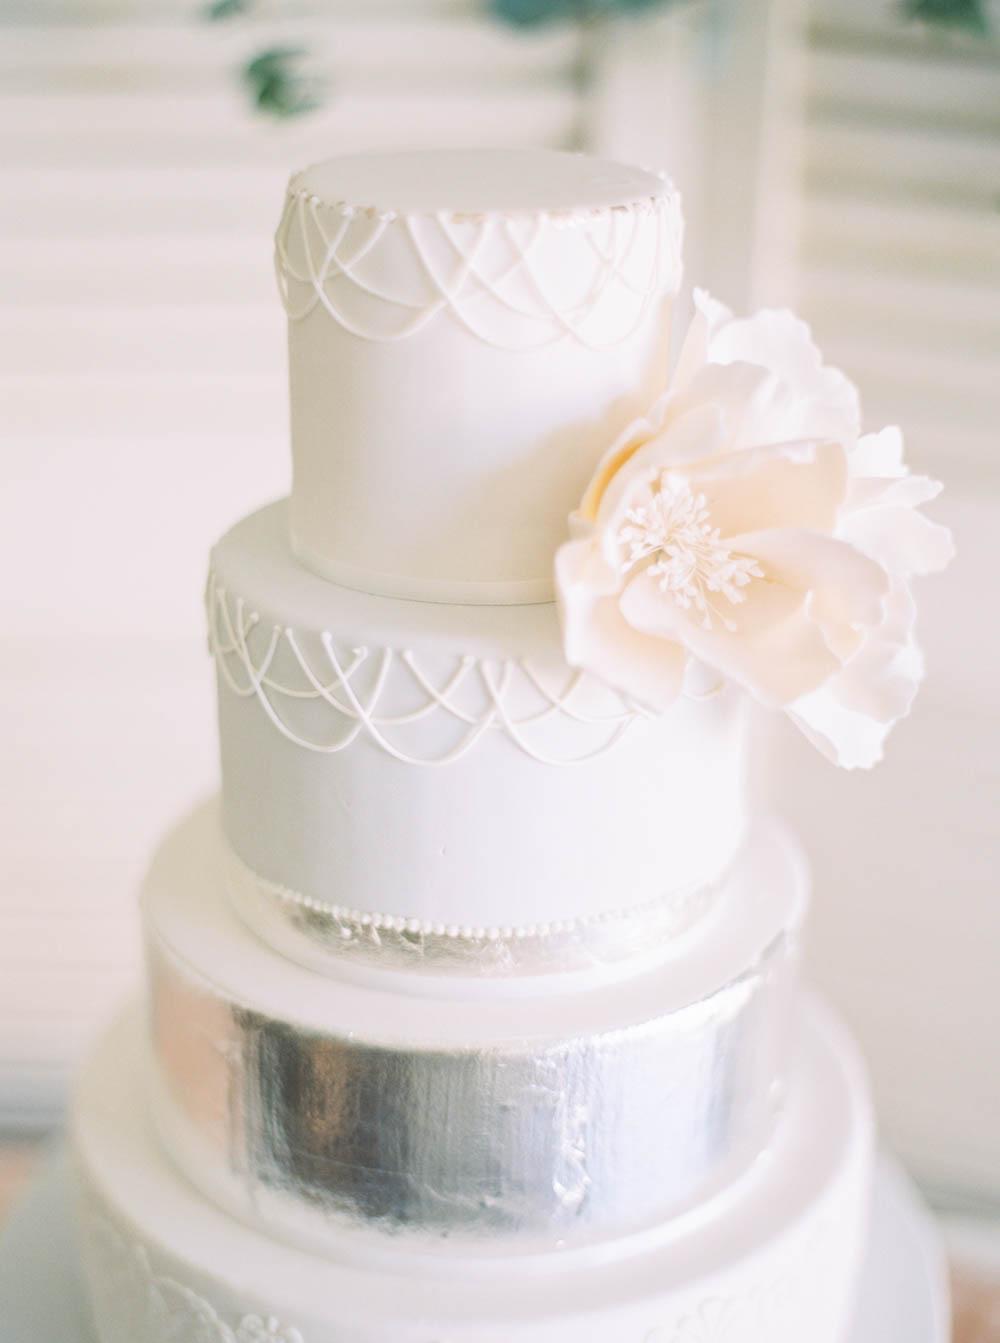 DeLaRosa Cake Shoot Katie Grant Photography-91.jpg